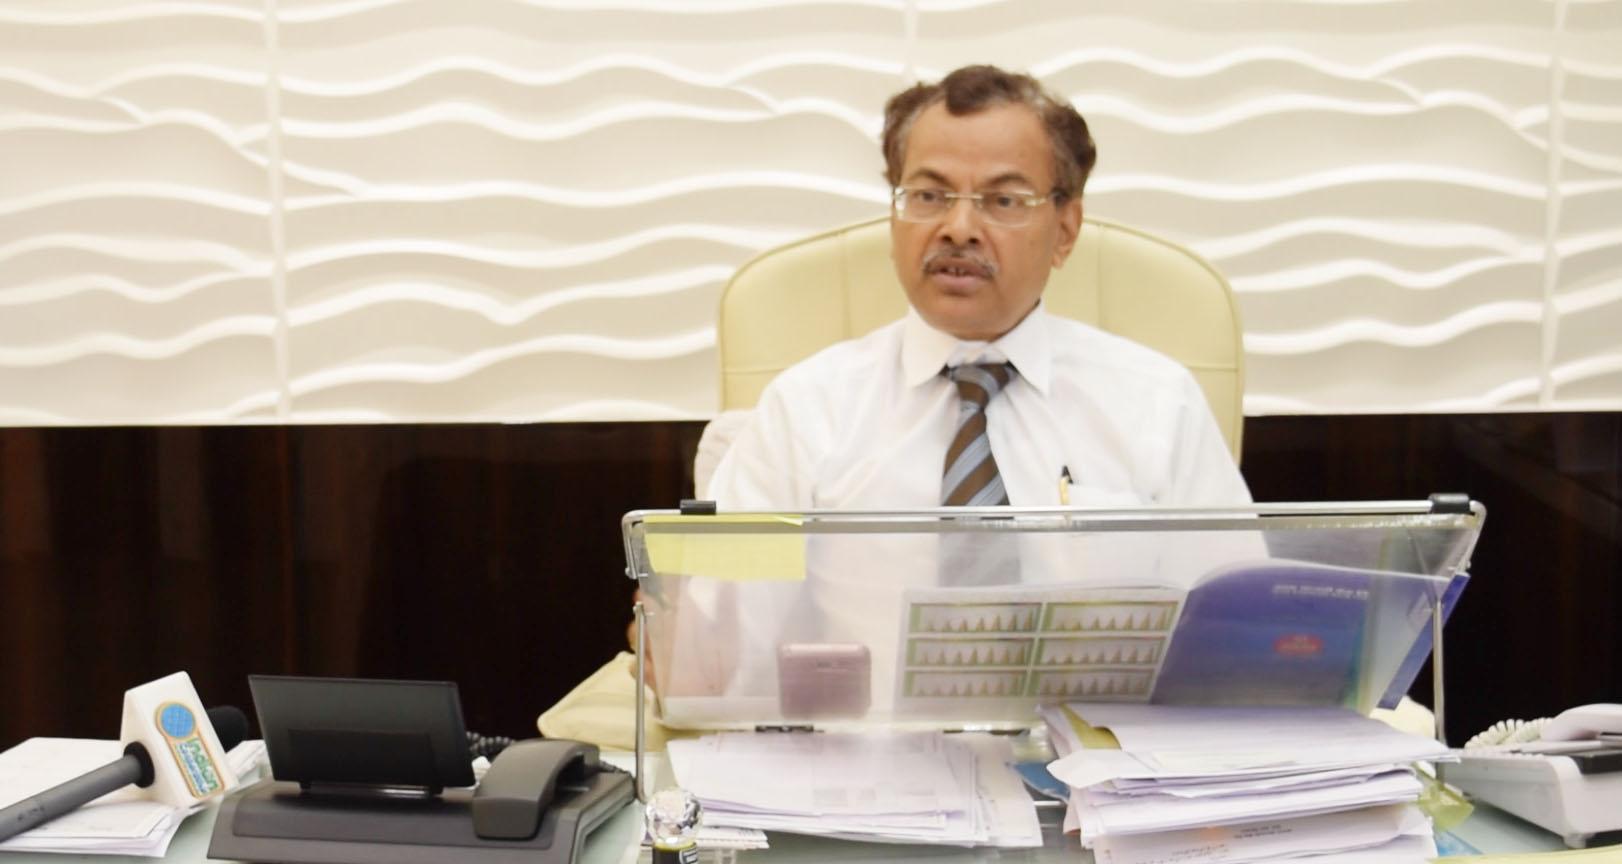 Apna Sahakari Bank earns a profit of 37 crore